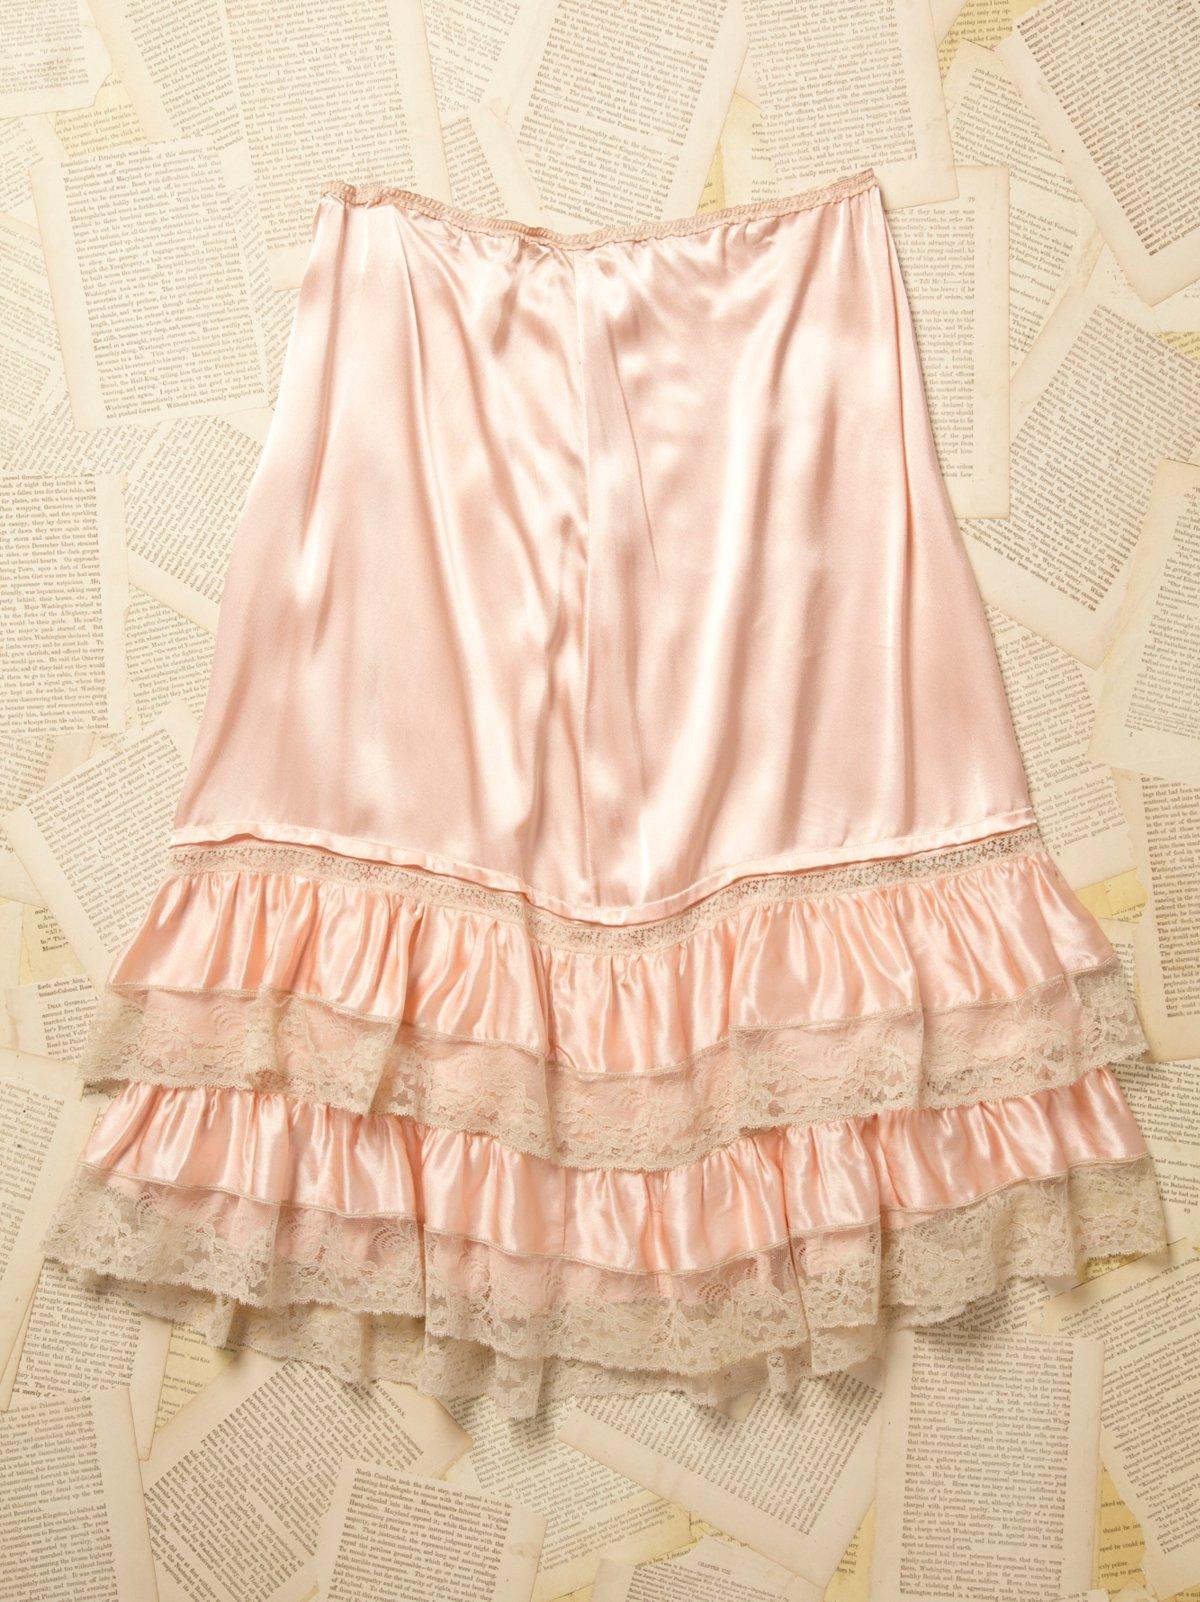 Vintage 1950s Peach Ruffle Skirt